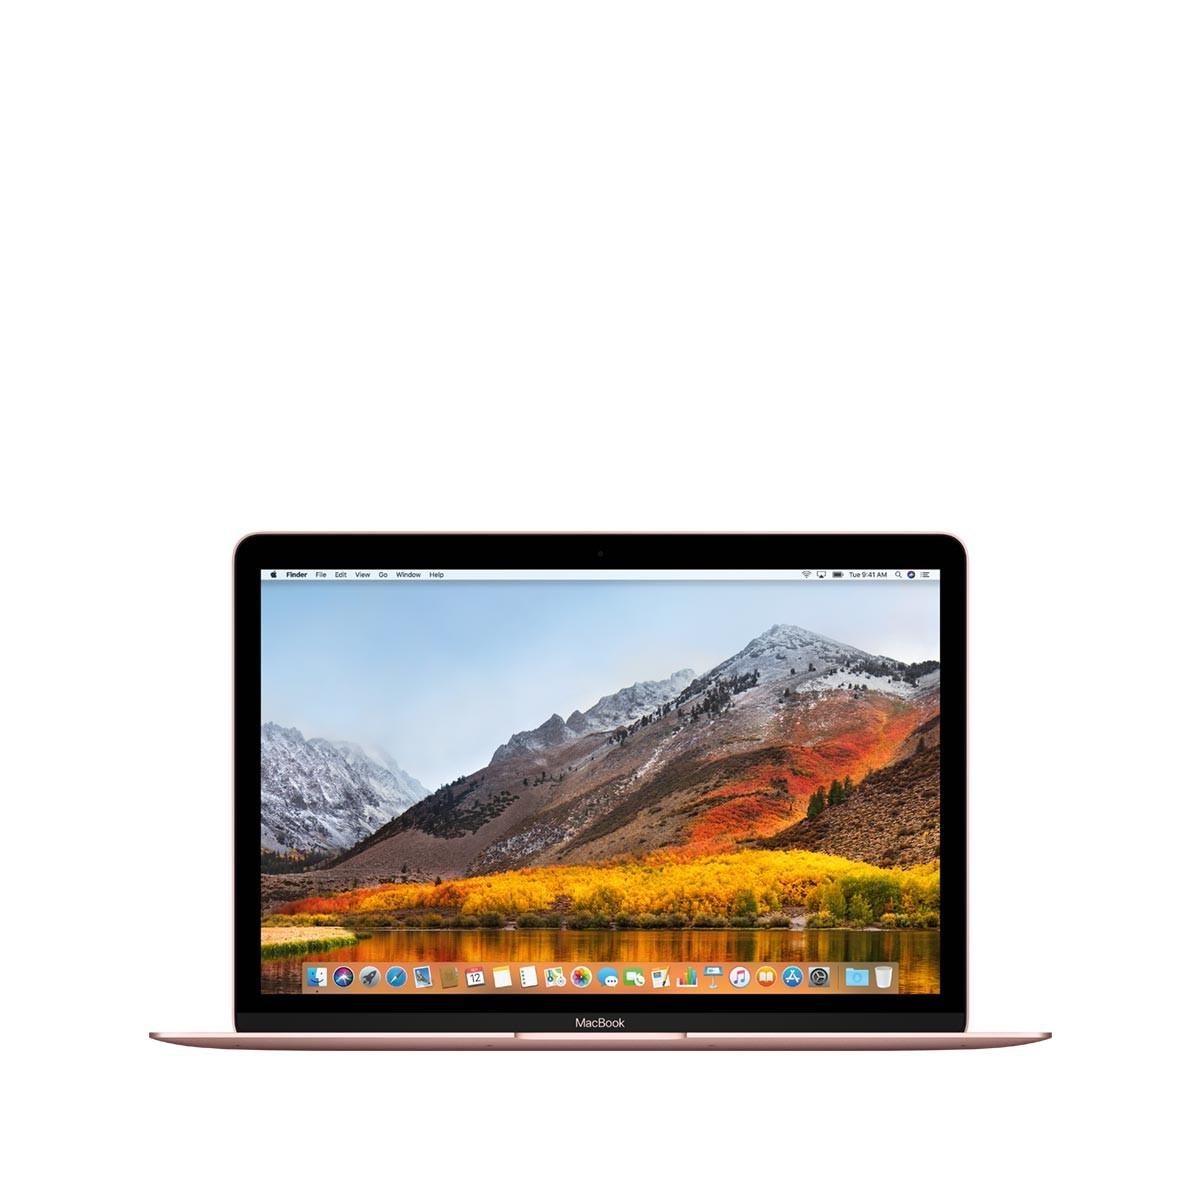 "Светлорозов лаптоп Apple MacBook"" с двуядрен 1,3GHz Intel Core i5 процесор, 512GB SSD памет - международна клавиатура"